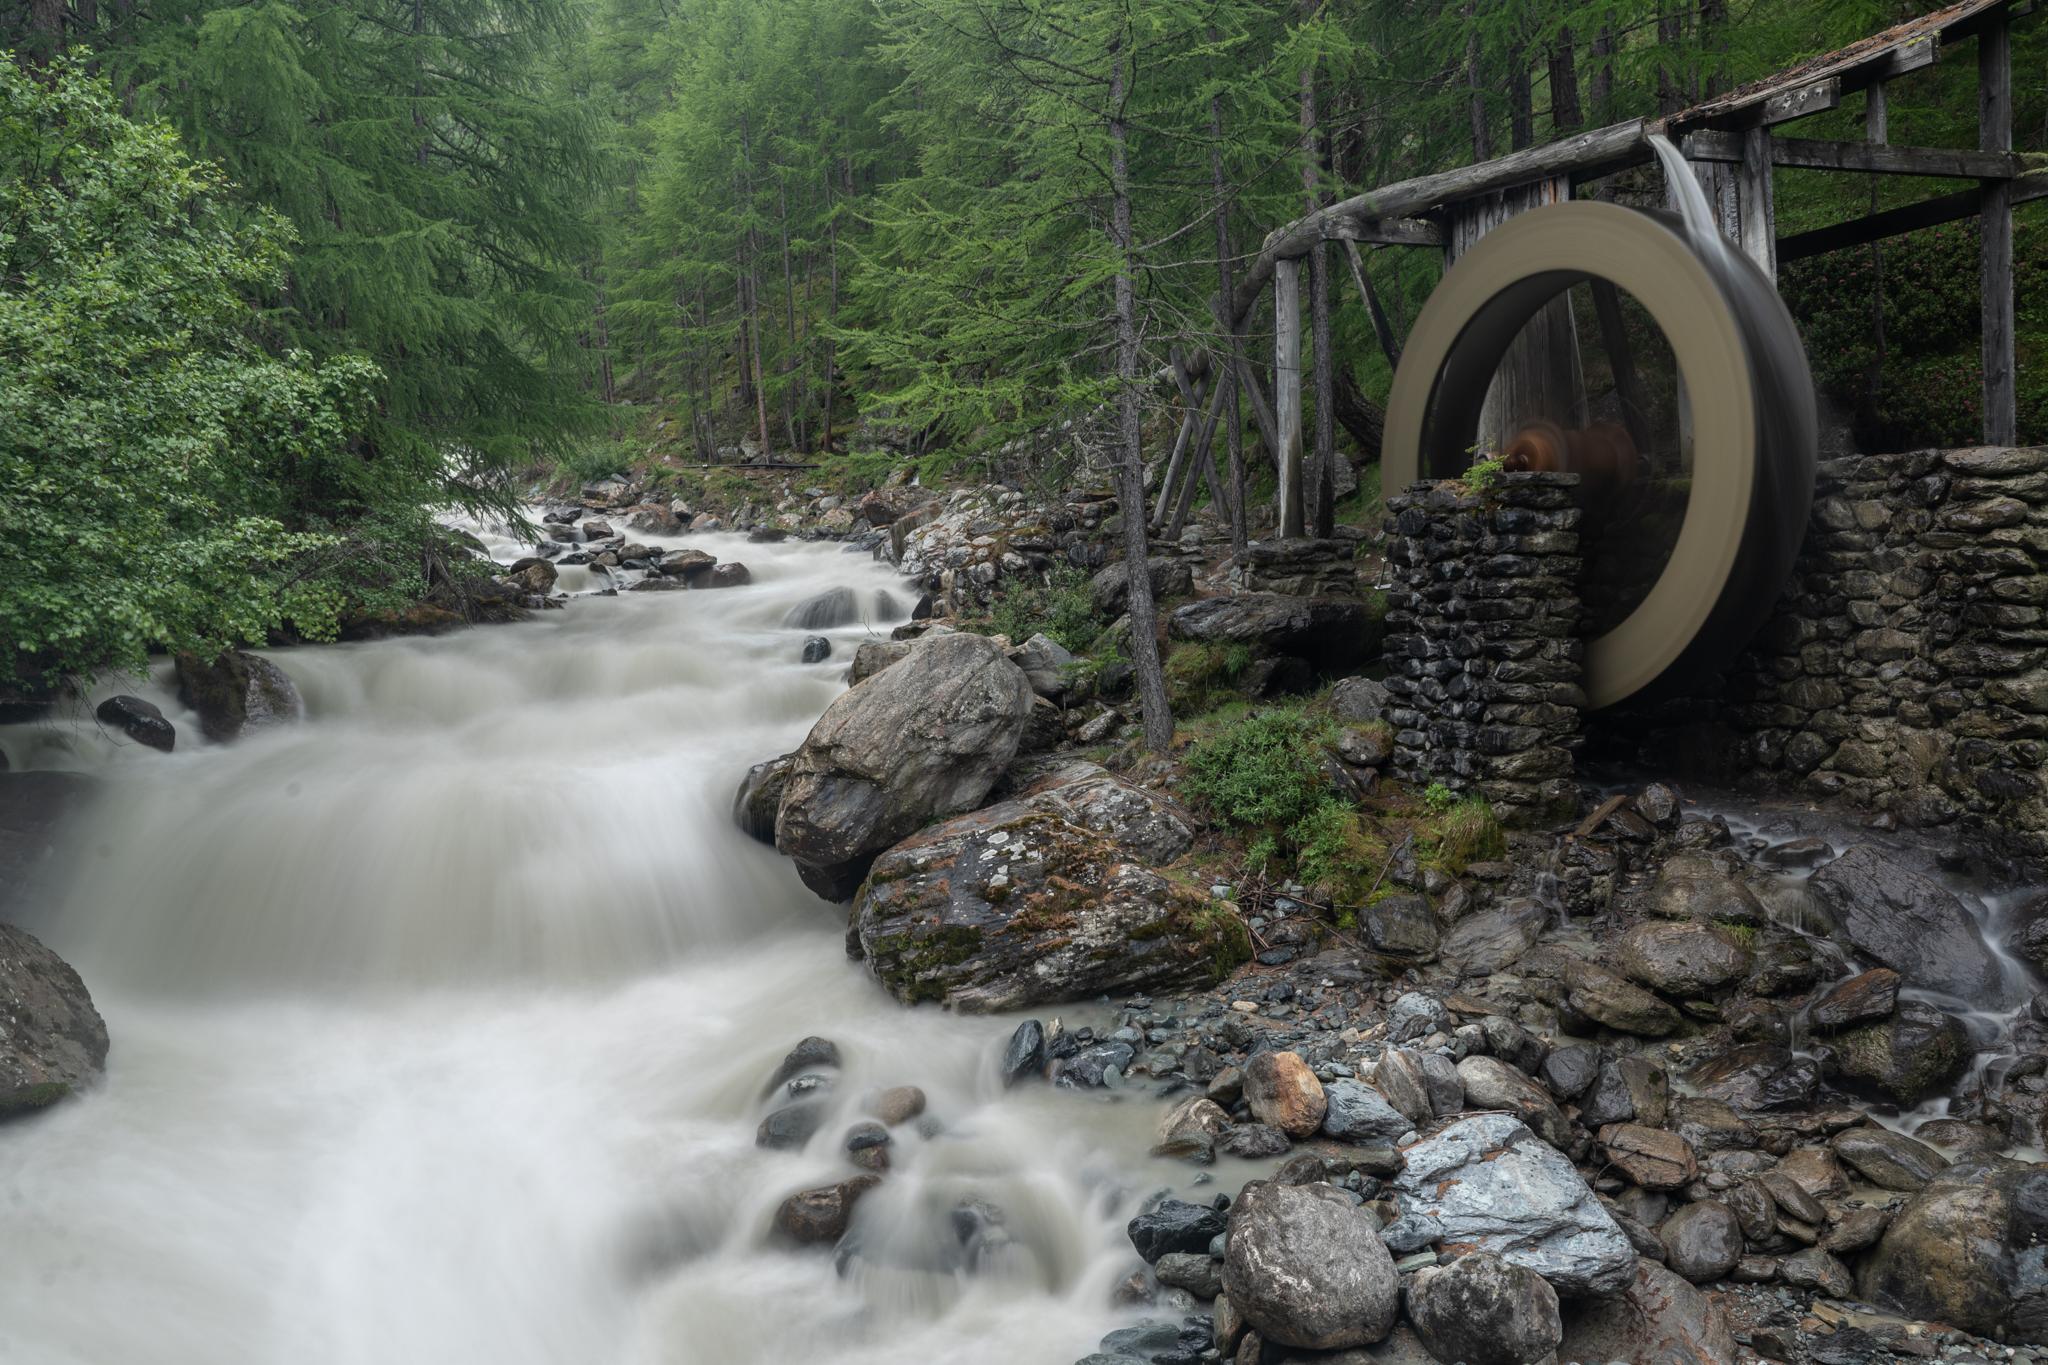 Old Mill Saas Fee, Switzerland